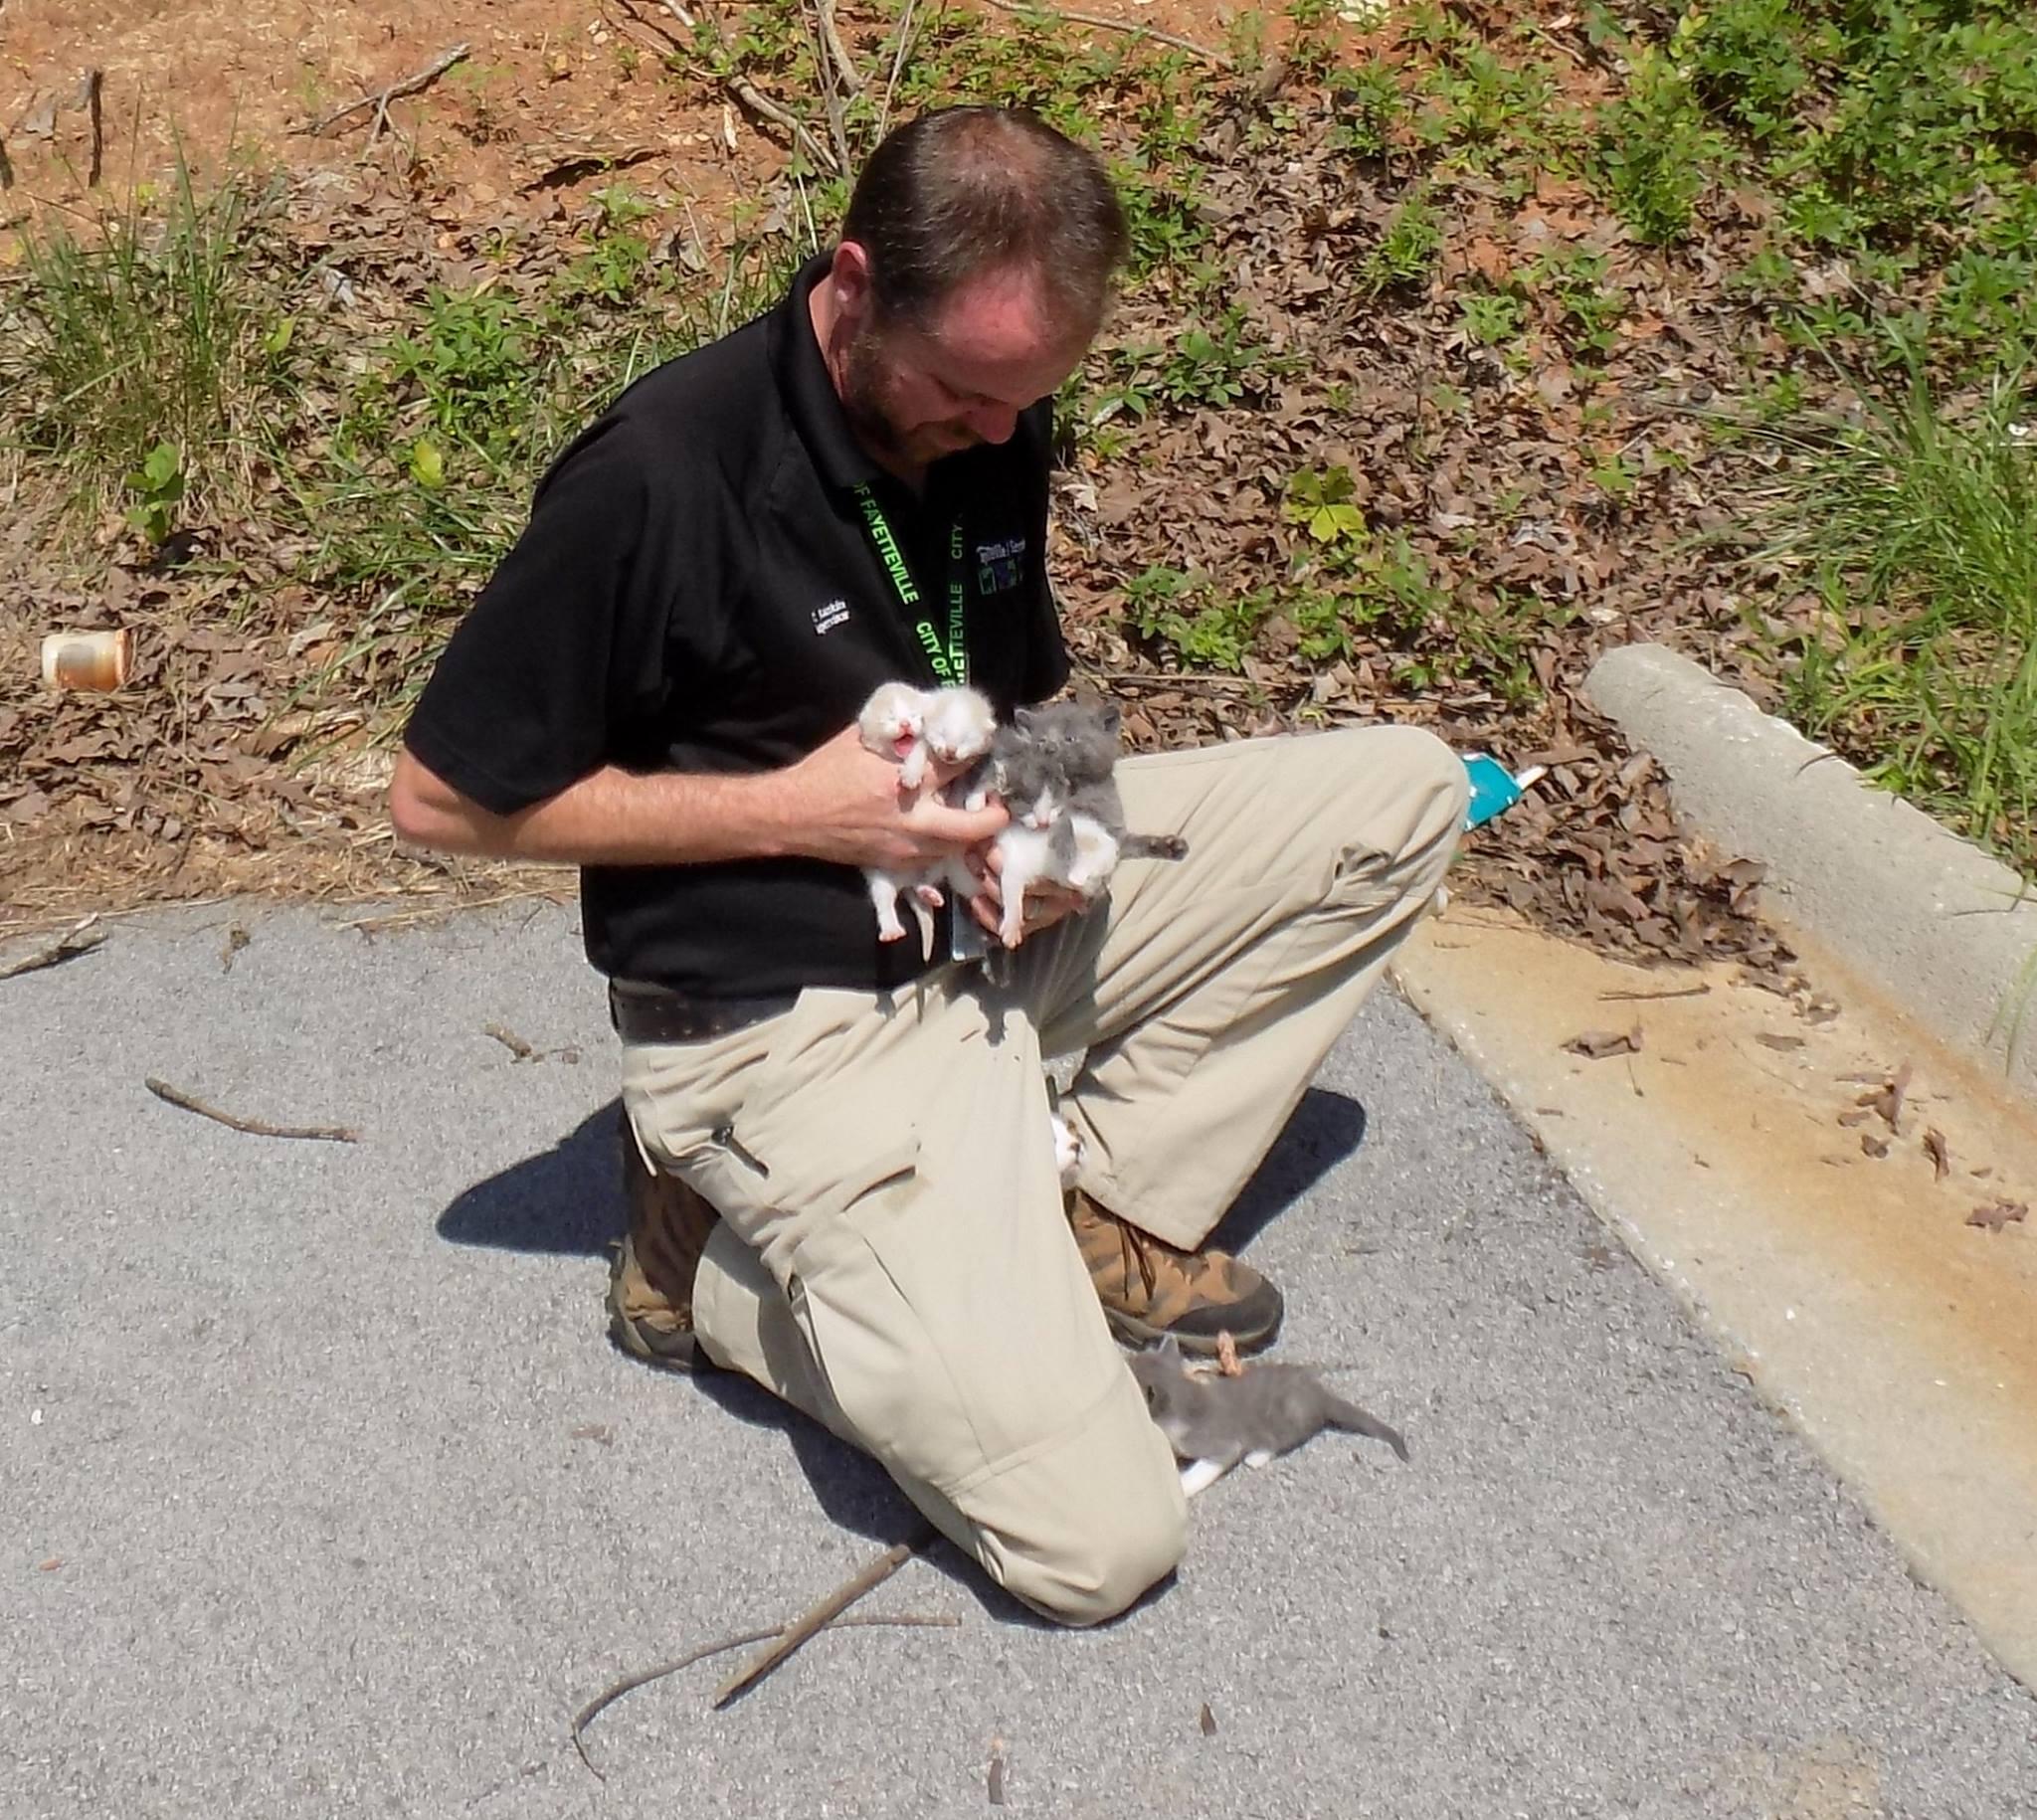 Courtesy: Fayetteville Animal Services